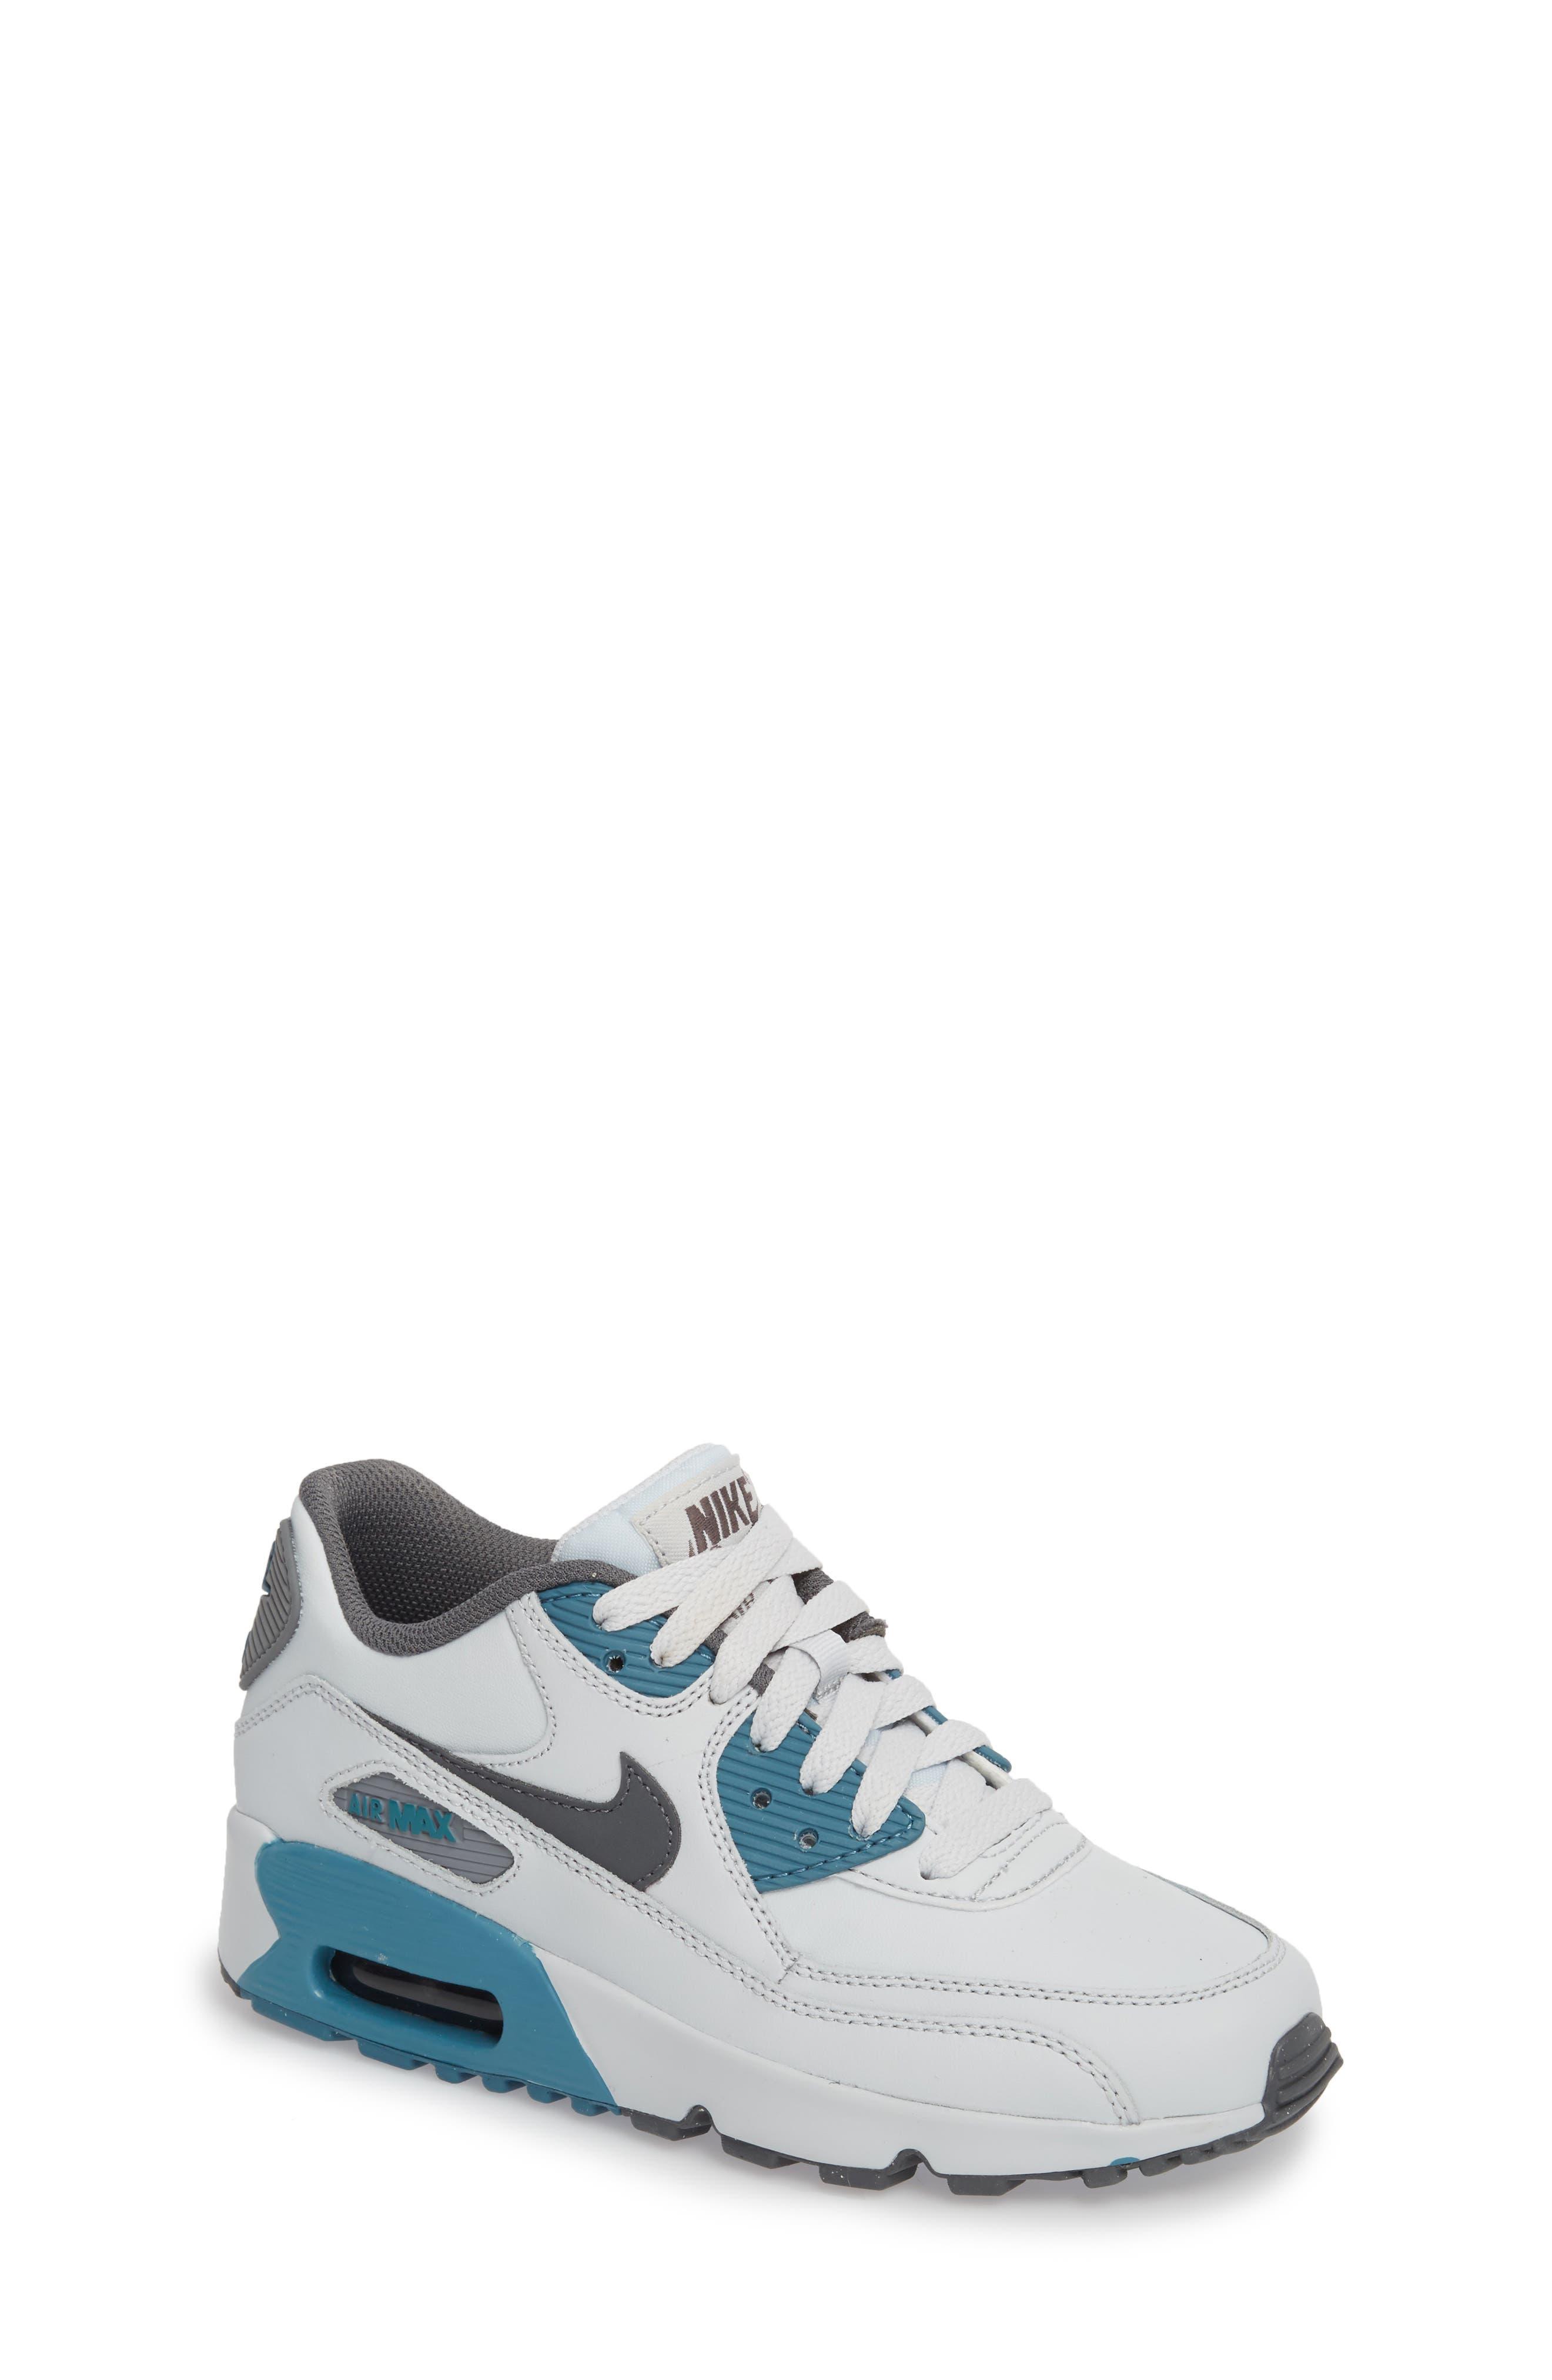 Air Max 90 Sneaker,                             Main thumbnail 1, color,                             040